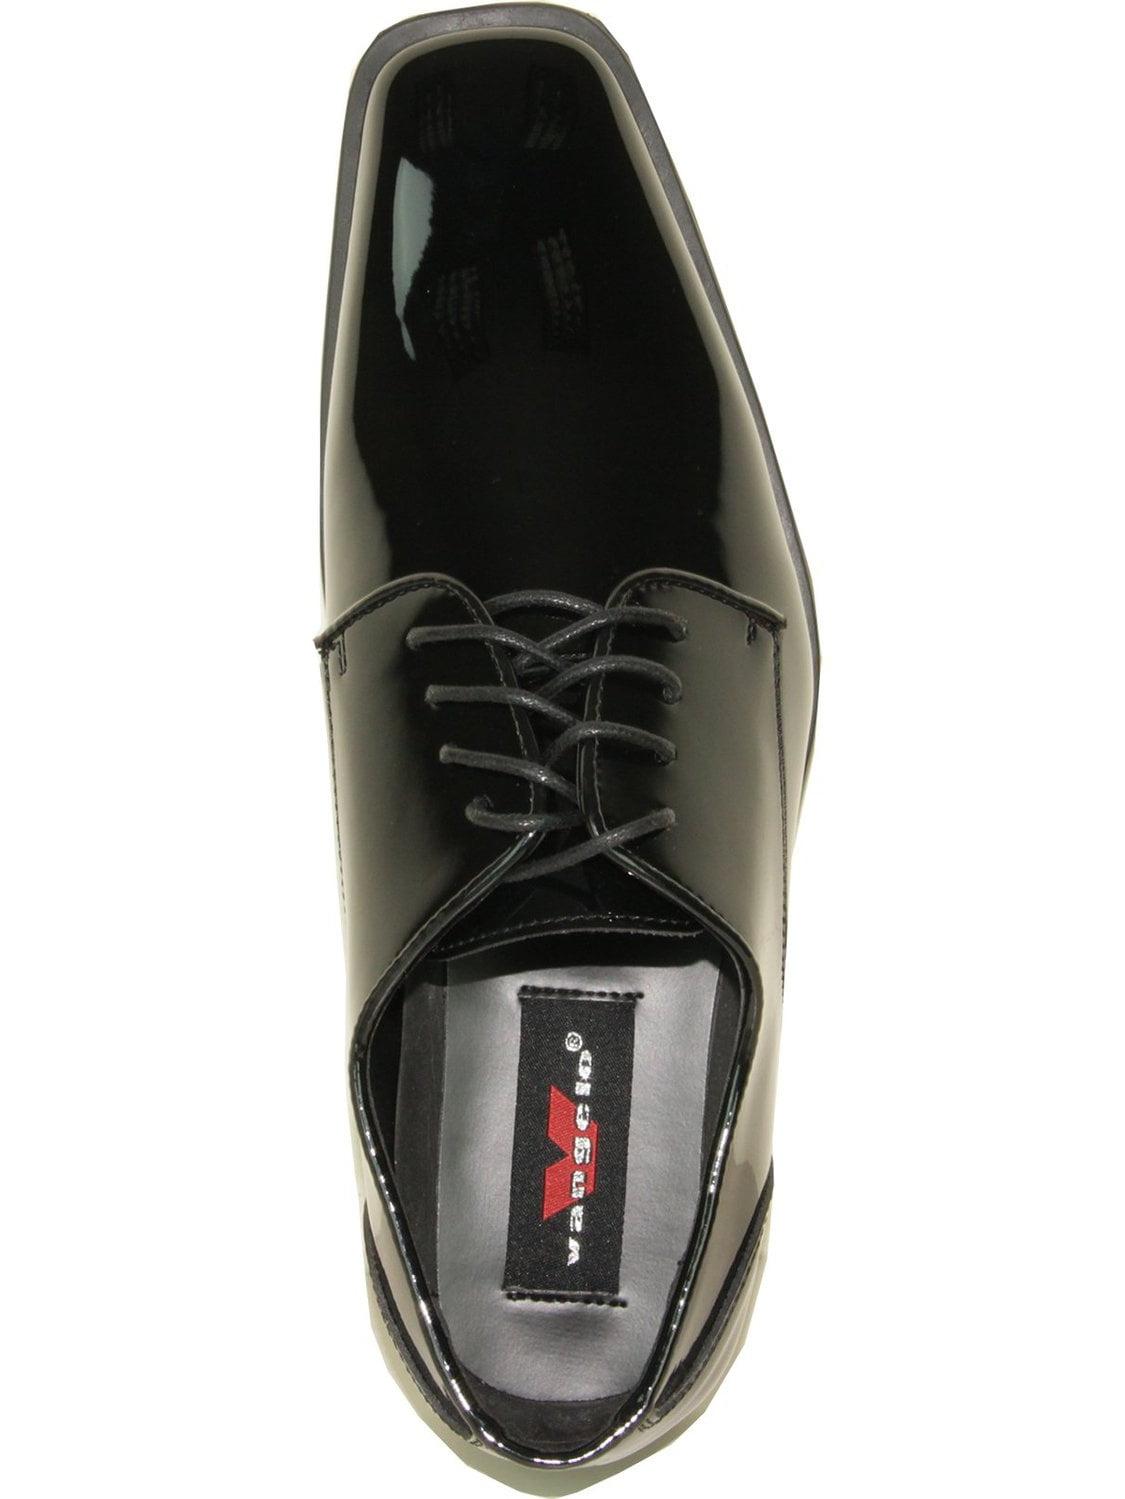 Bravo VANGELO Men Tuxedo Shoe Tux-5 Square Toe for Wedding School Uniform /& Formal Event Iron Grey